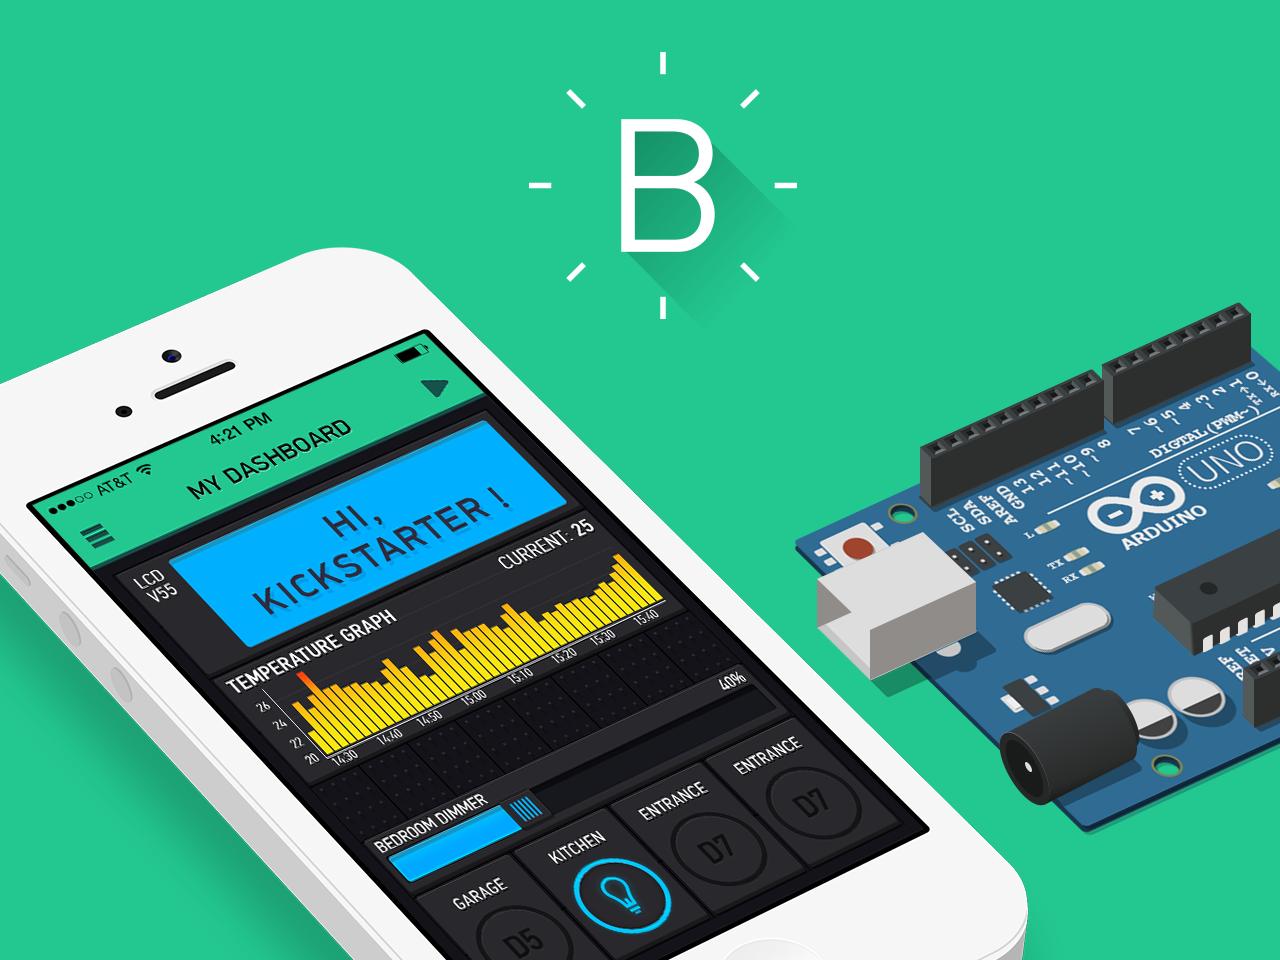 Blynk Download Read Ebook Arduino For Dummies Free Pdf Ebook969w